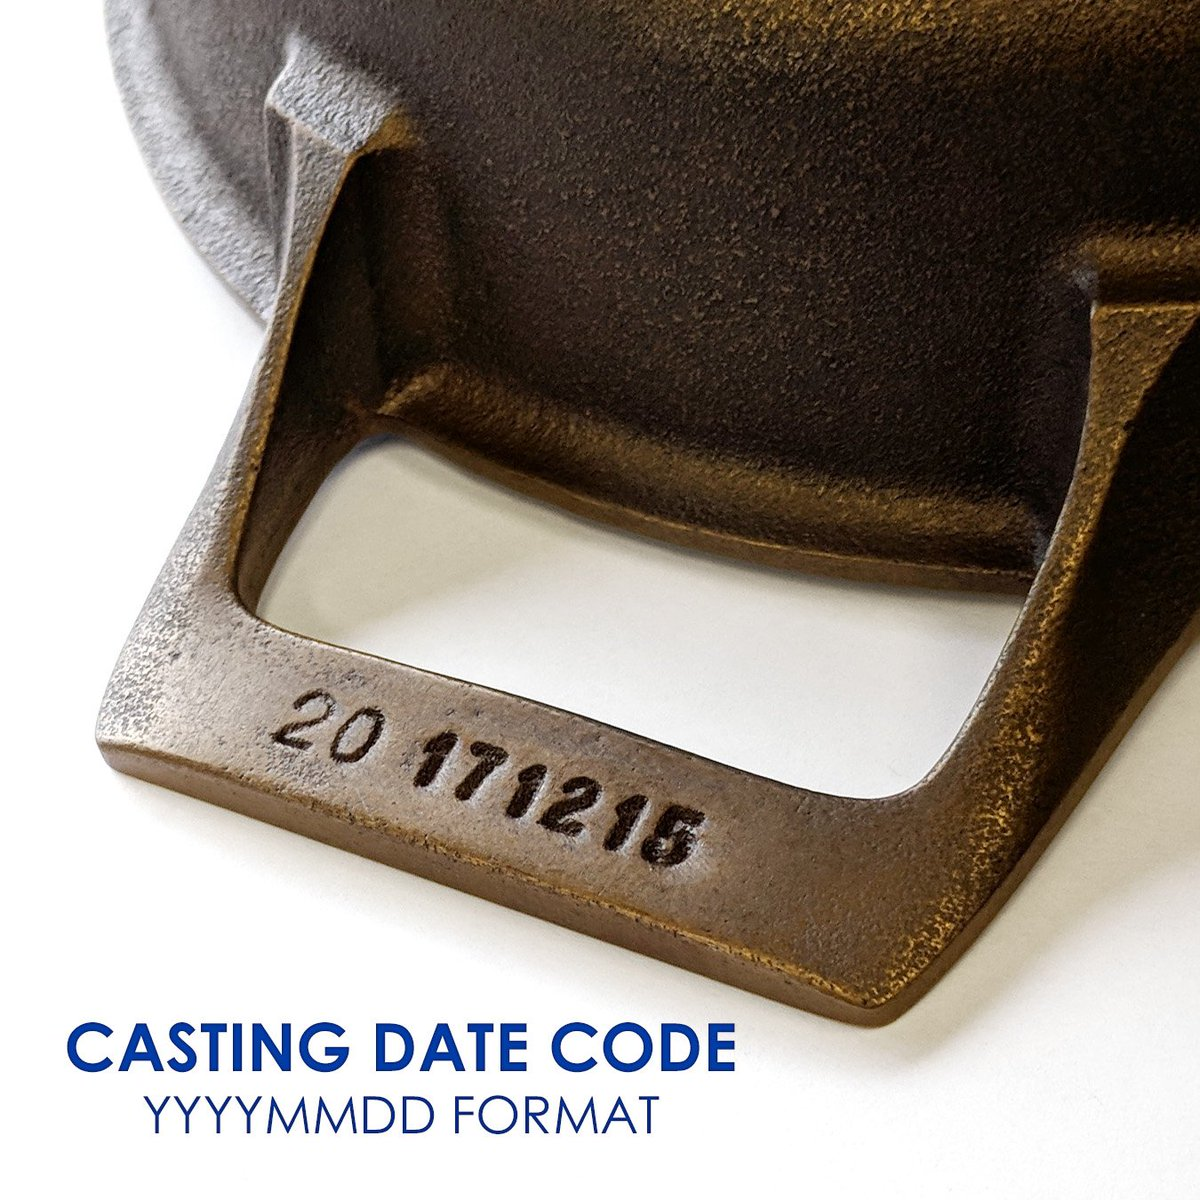 cast iron skillet dating